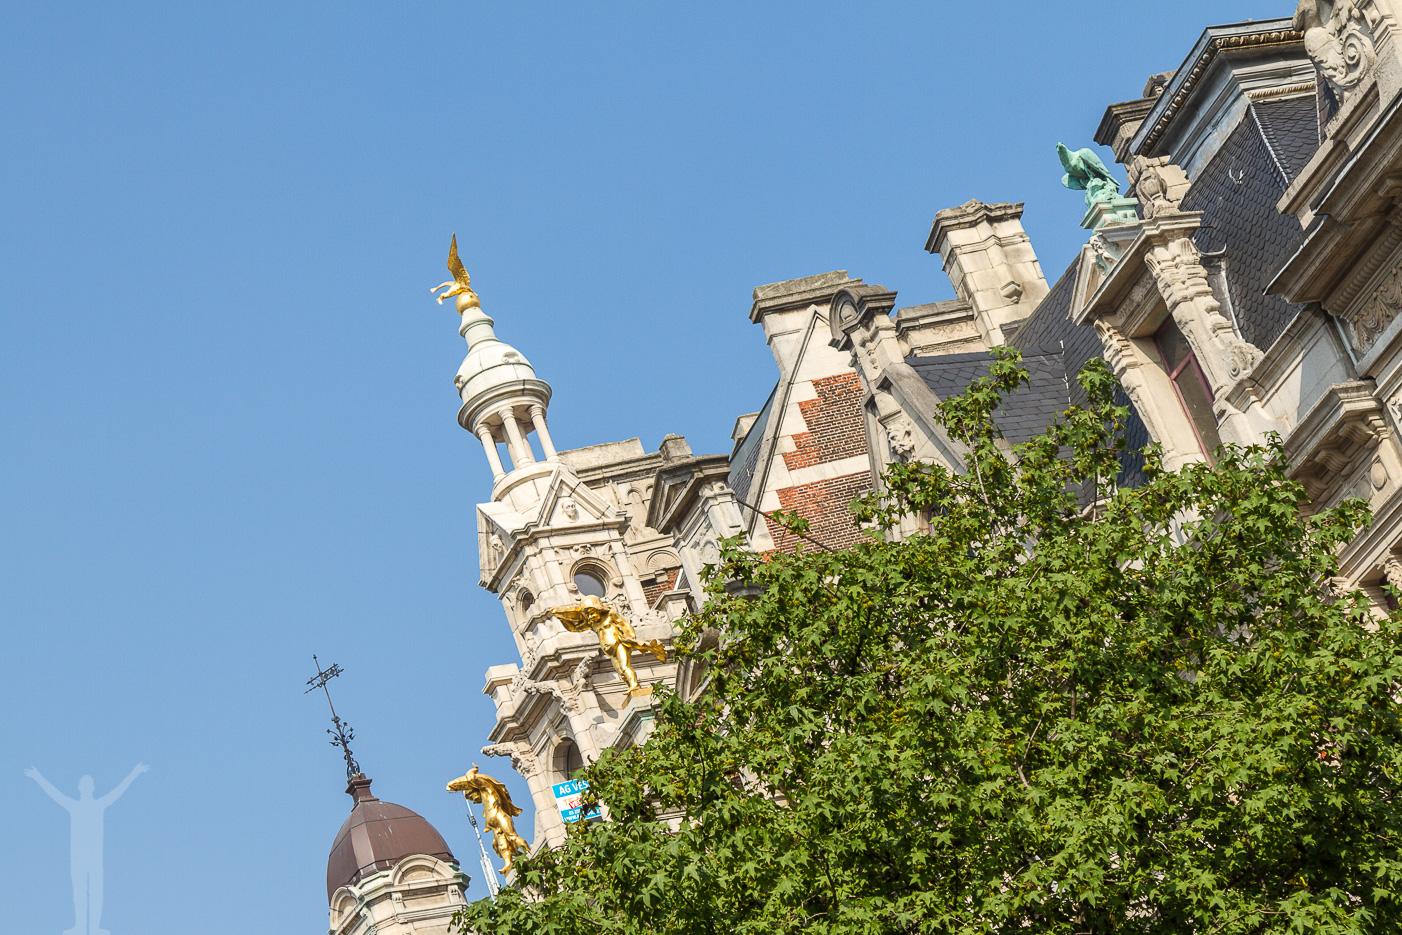 Barocken i Antwerpen